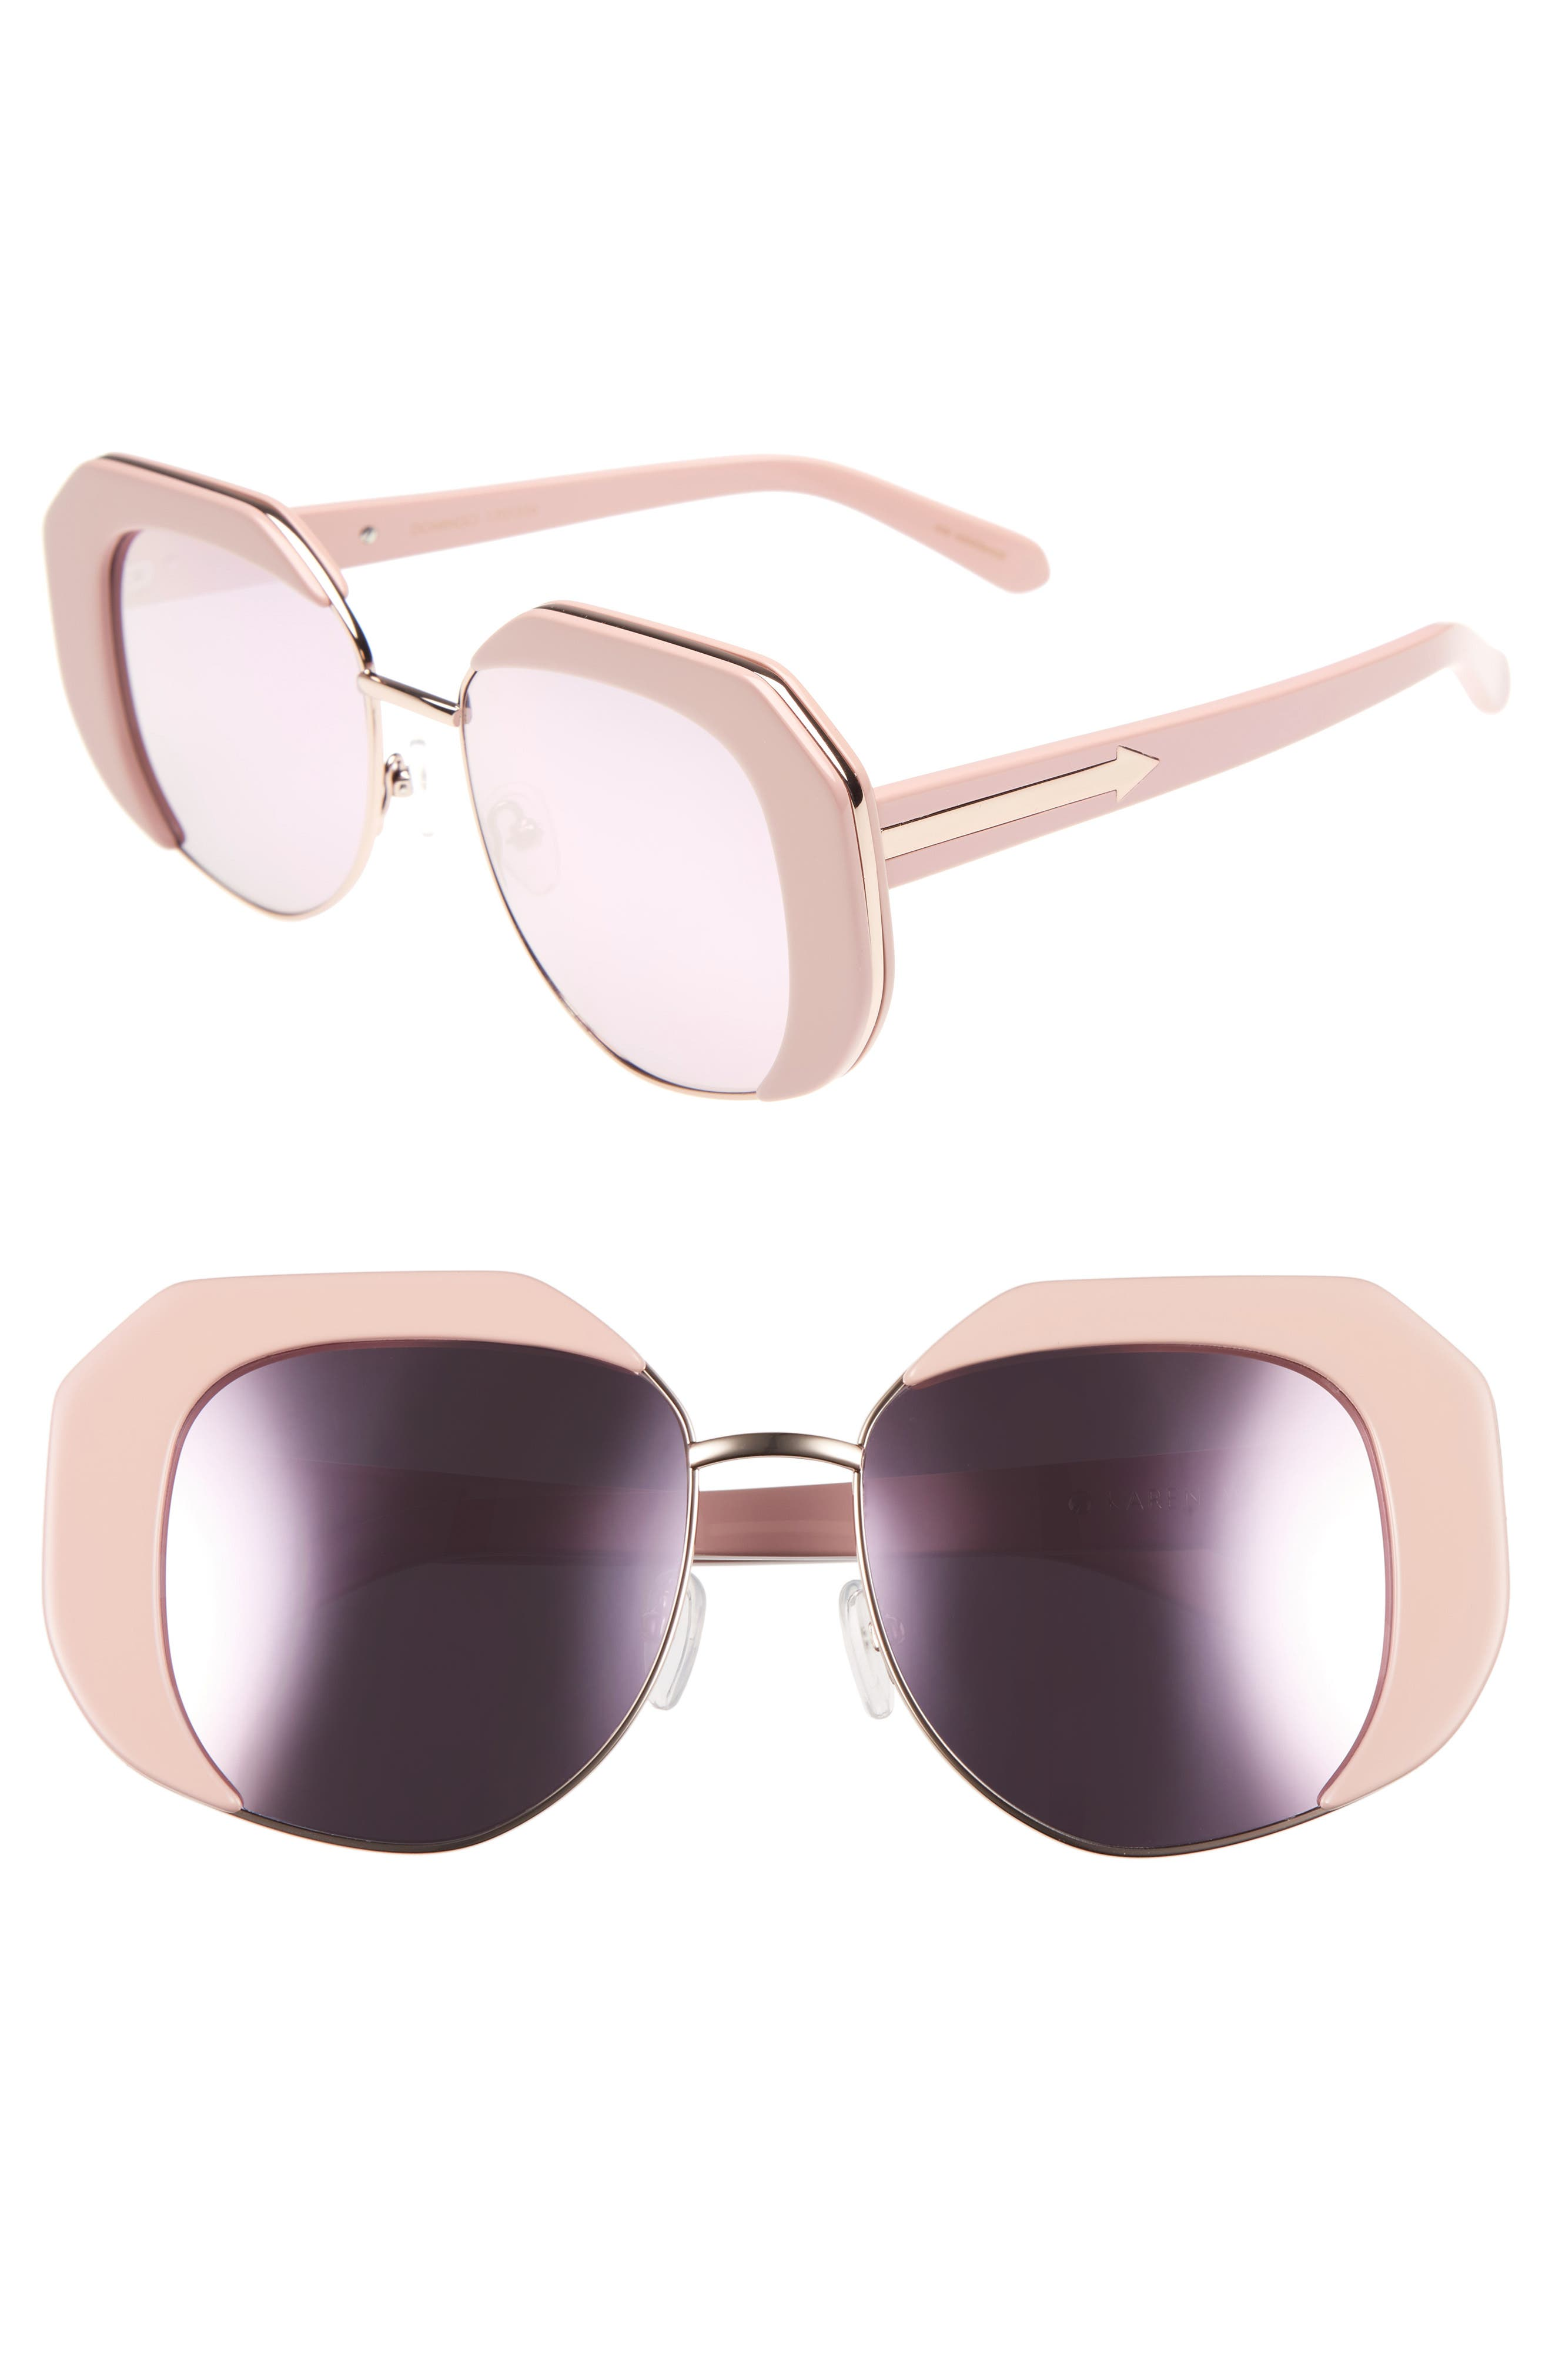 Domingo 52mm Sunglasses,                             Main thumbnail 3, color,